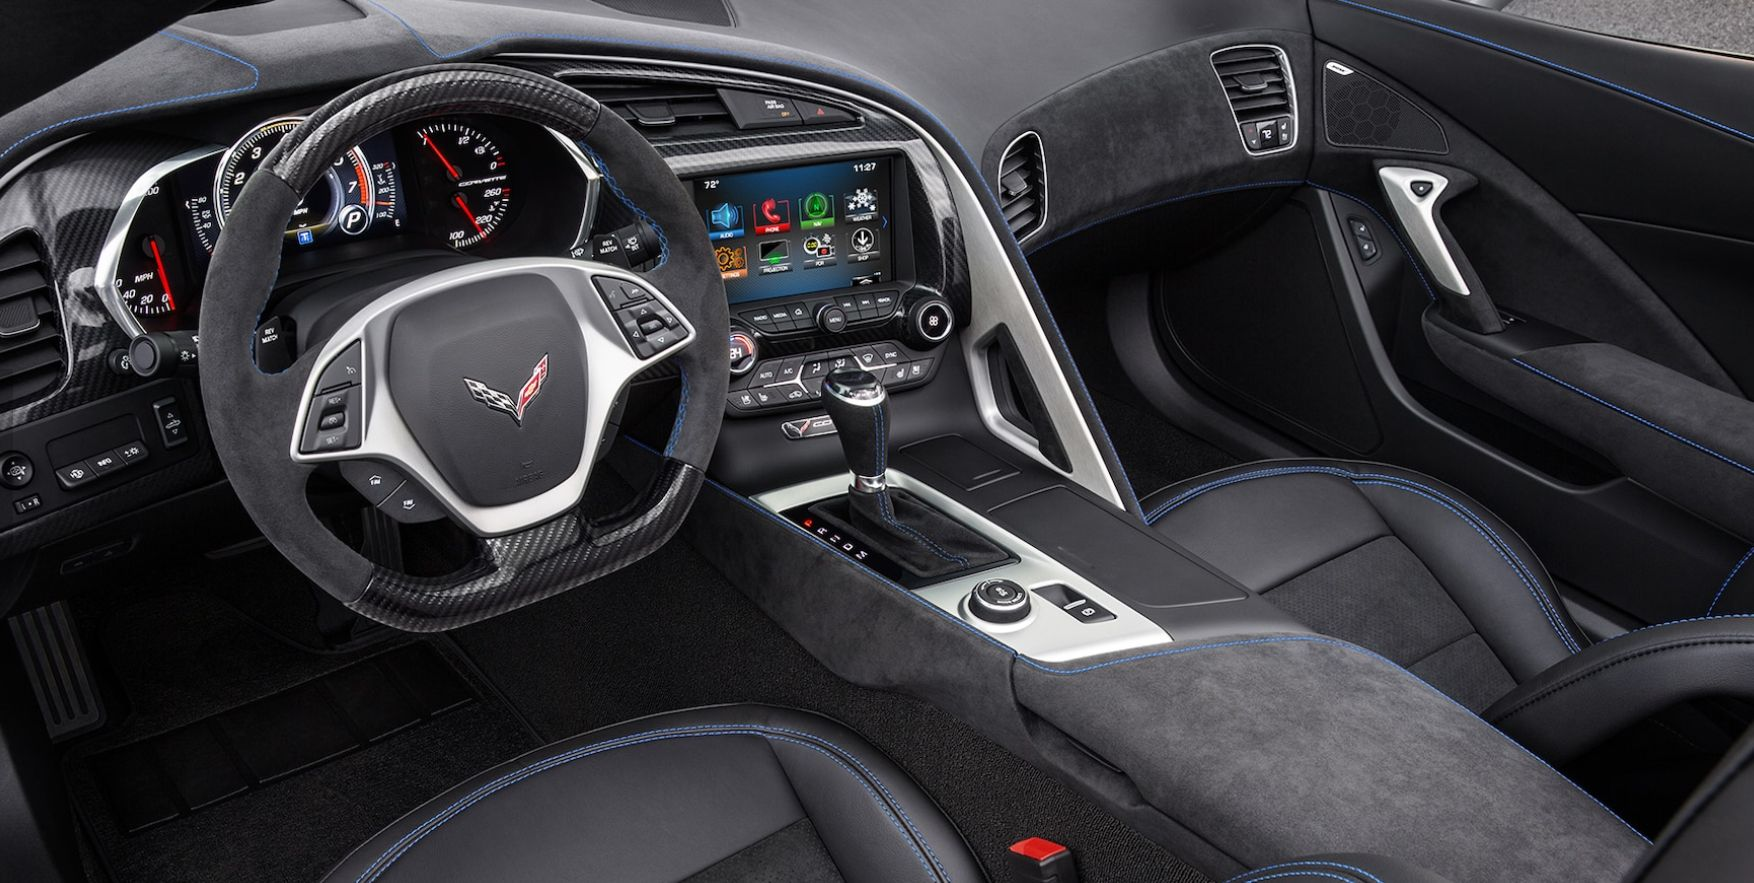 2018 Stingray Corvette grand sport, Corvette, Cool